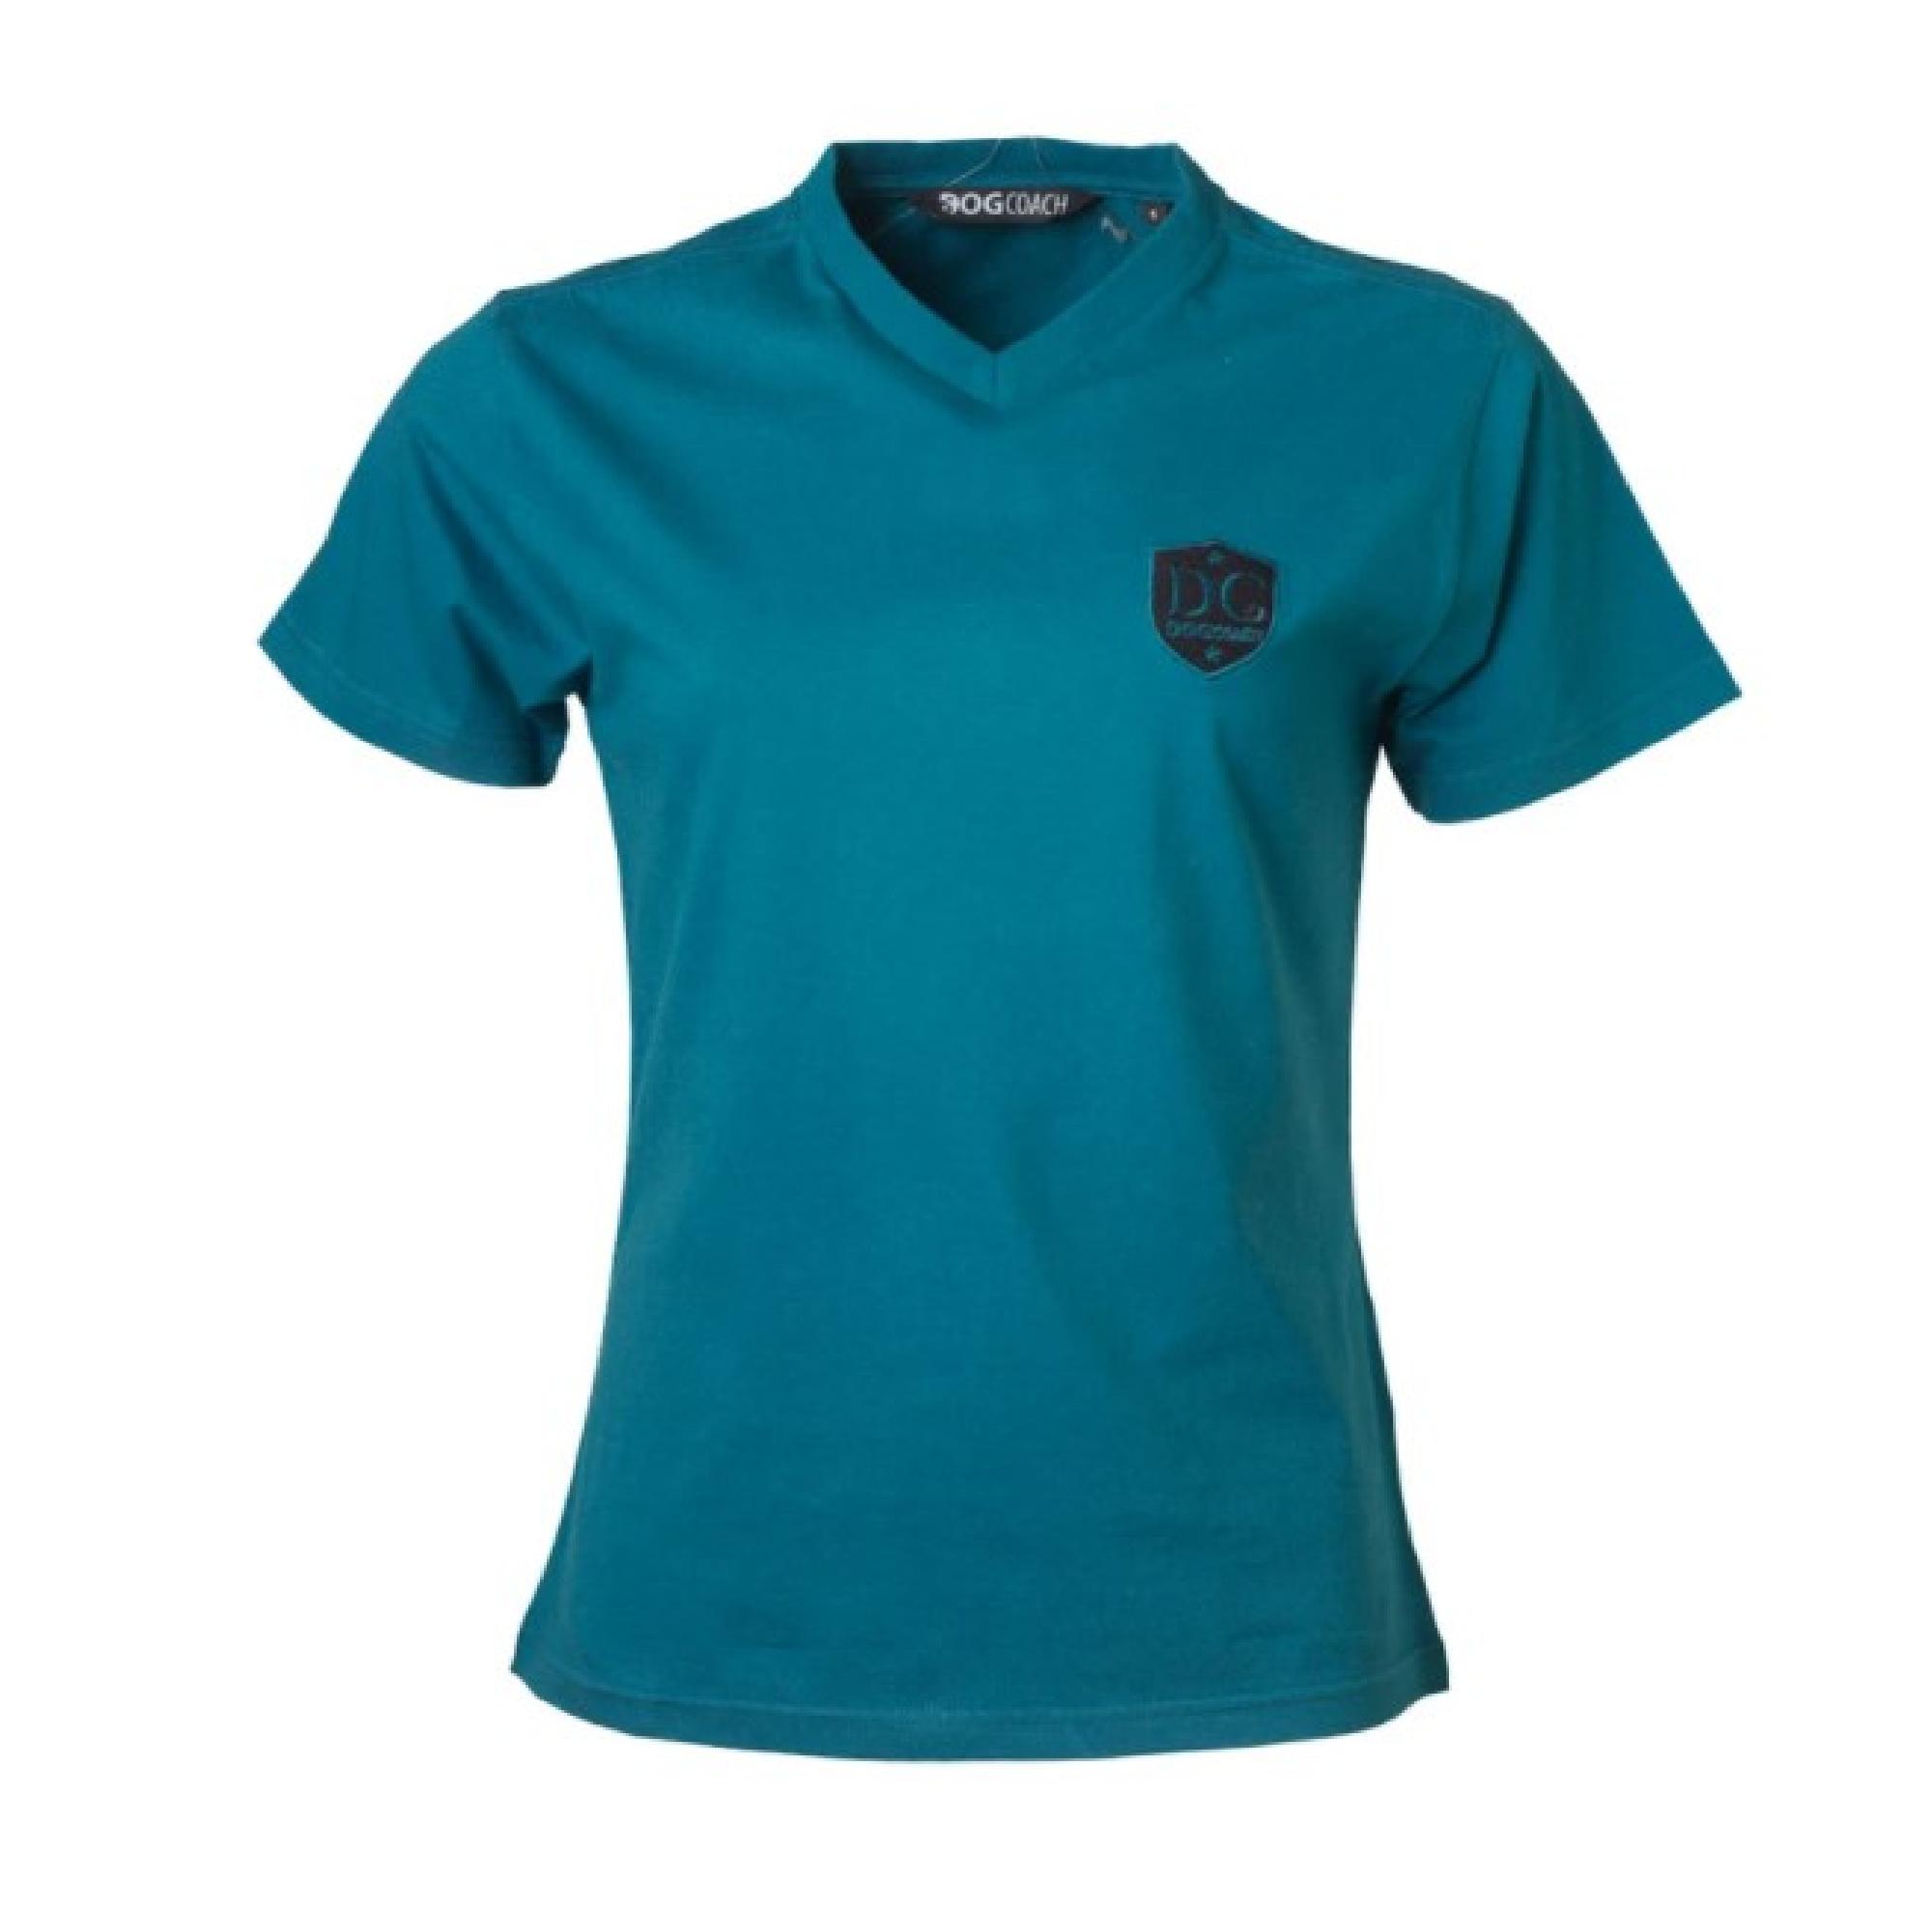 DogCoach T-shirt Woman